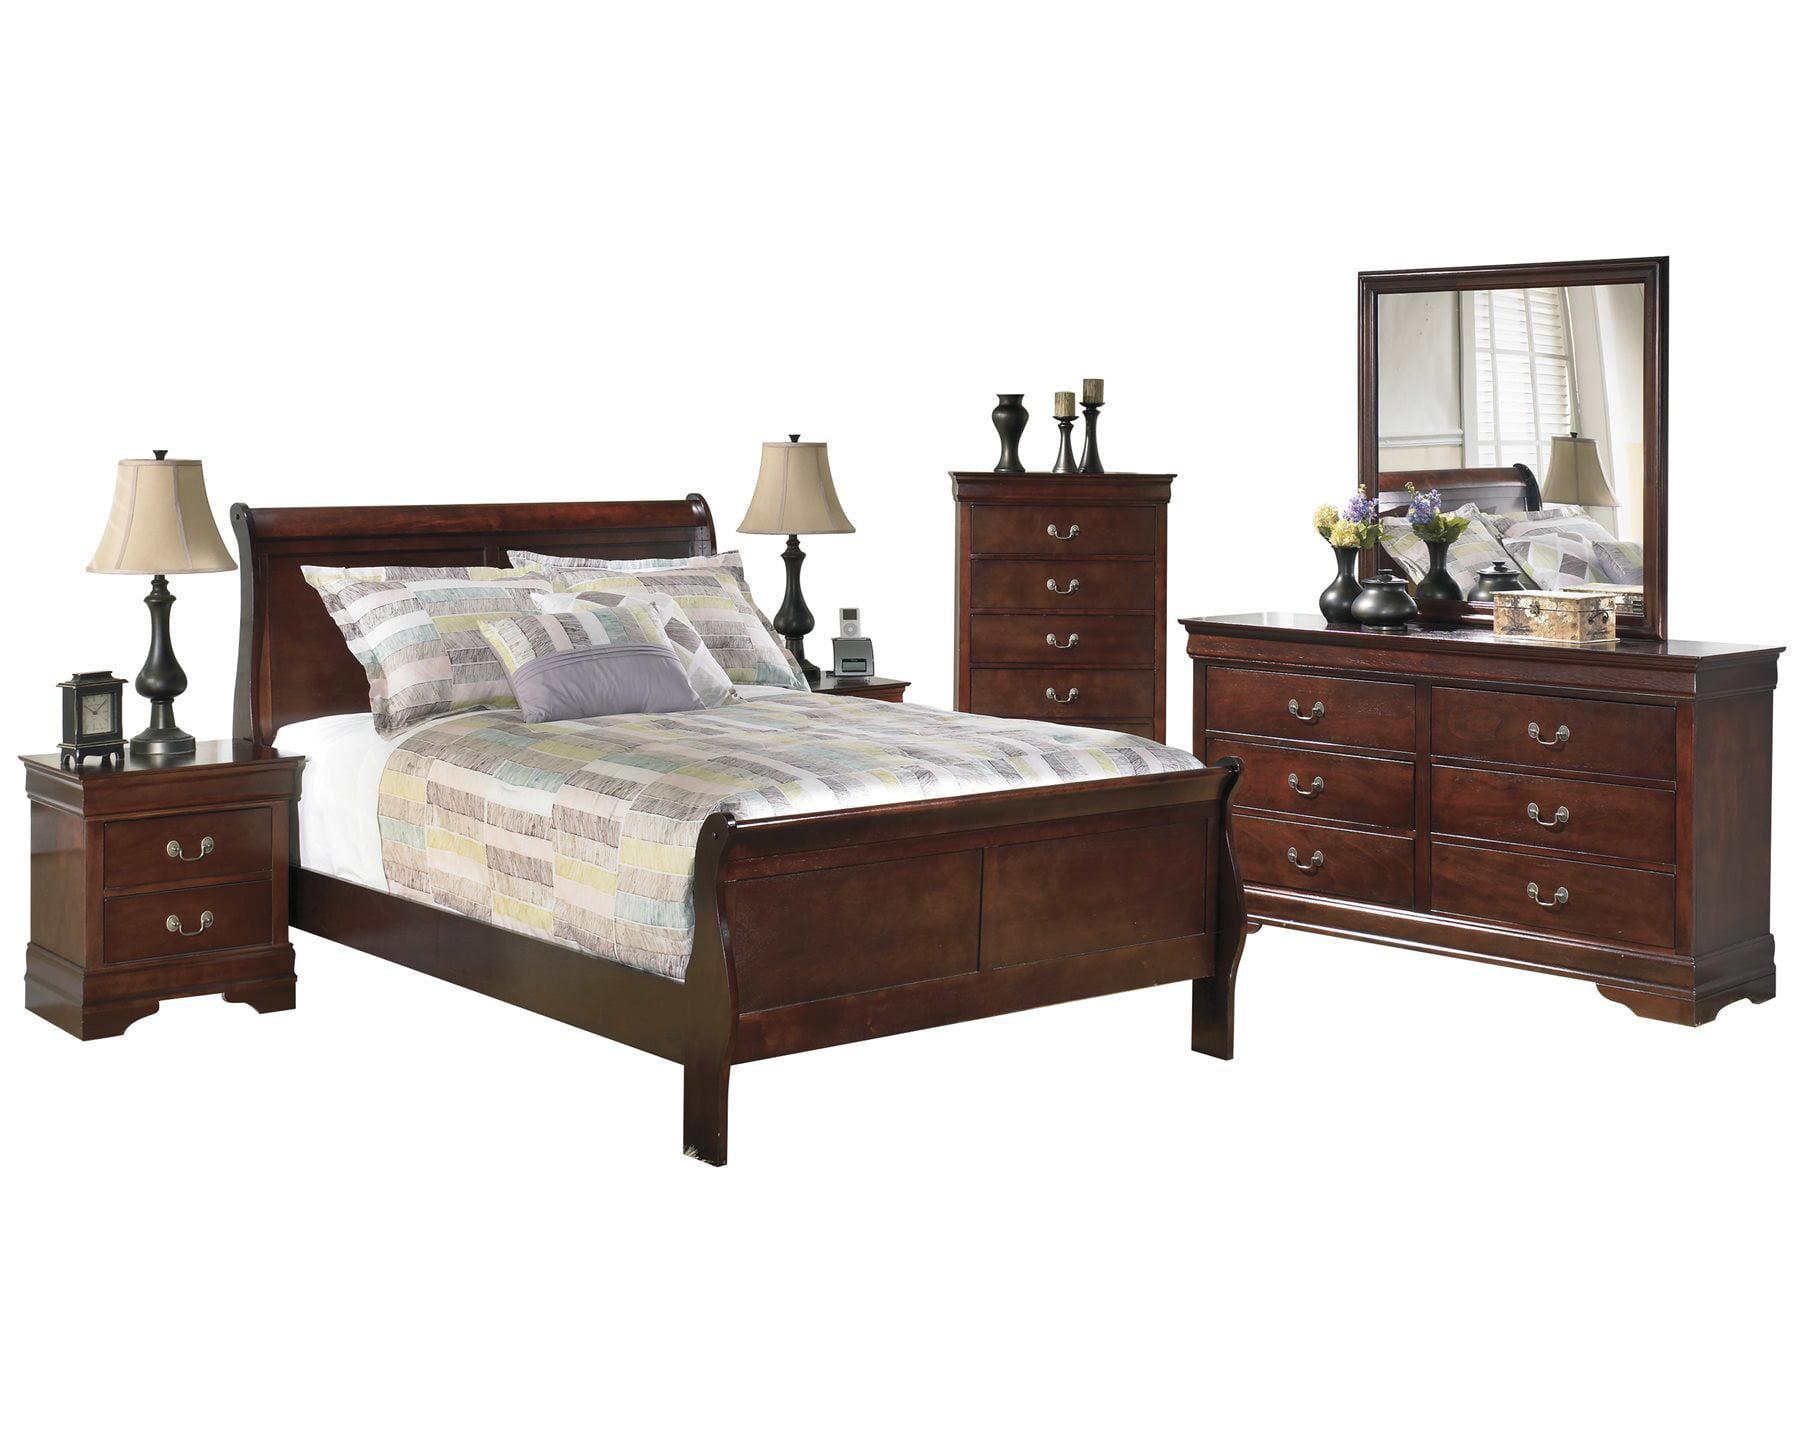 Ashley Furniture Alisdair 6 PC Bedroom Set: Cal King Sleigh Bed 2  Nightstand Dresser Mirror Chest Dark Brown - Walmart.com